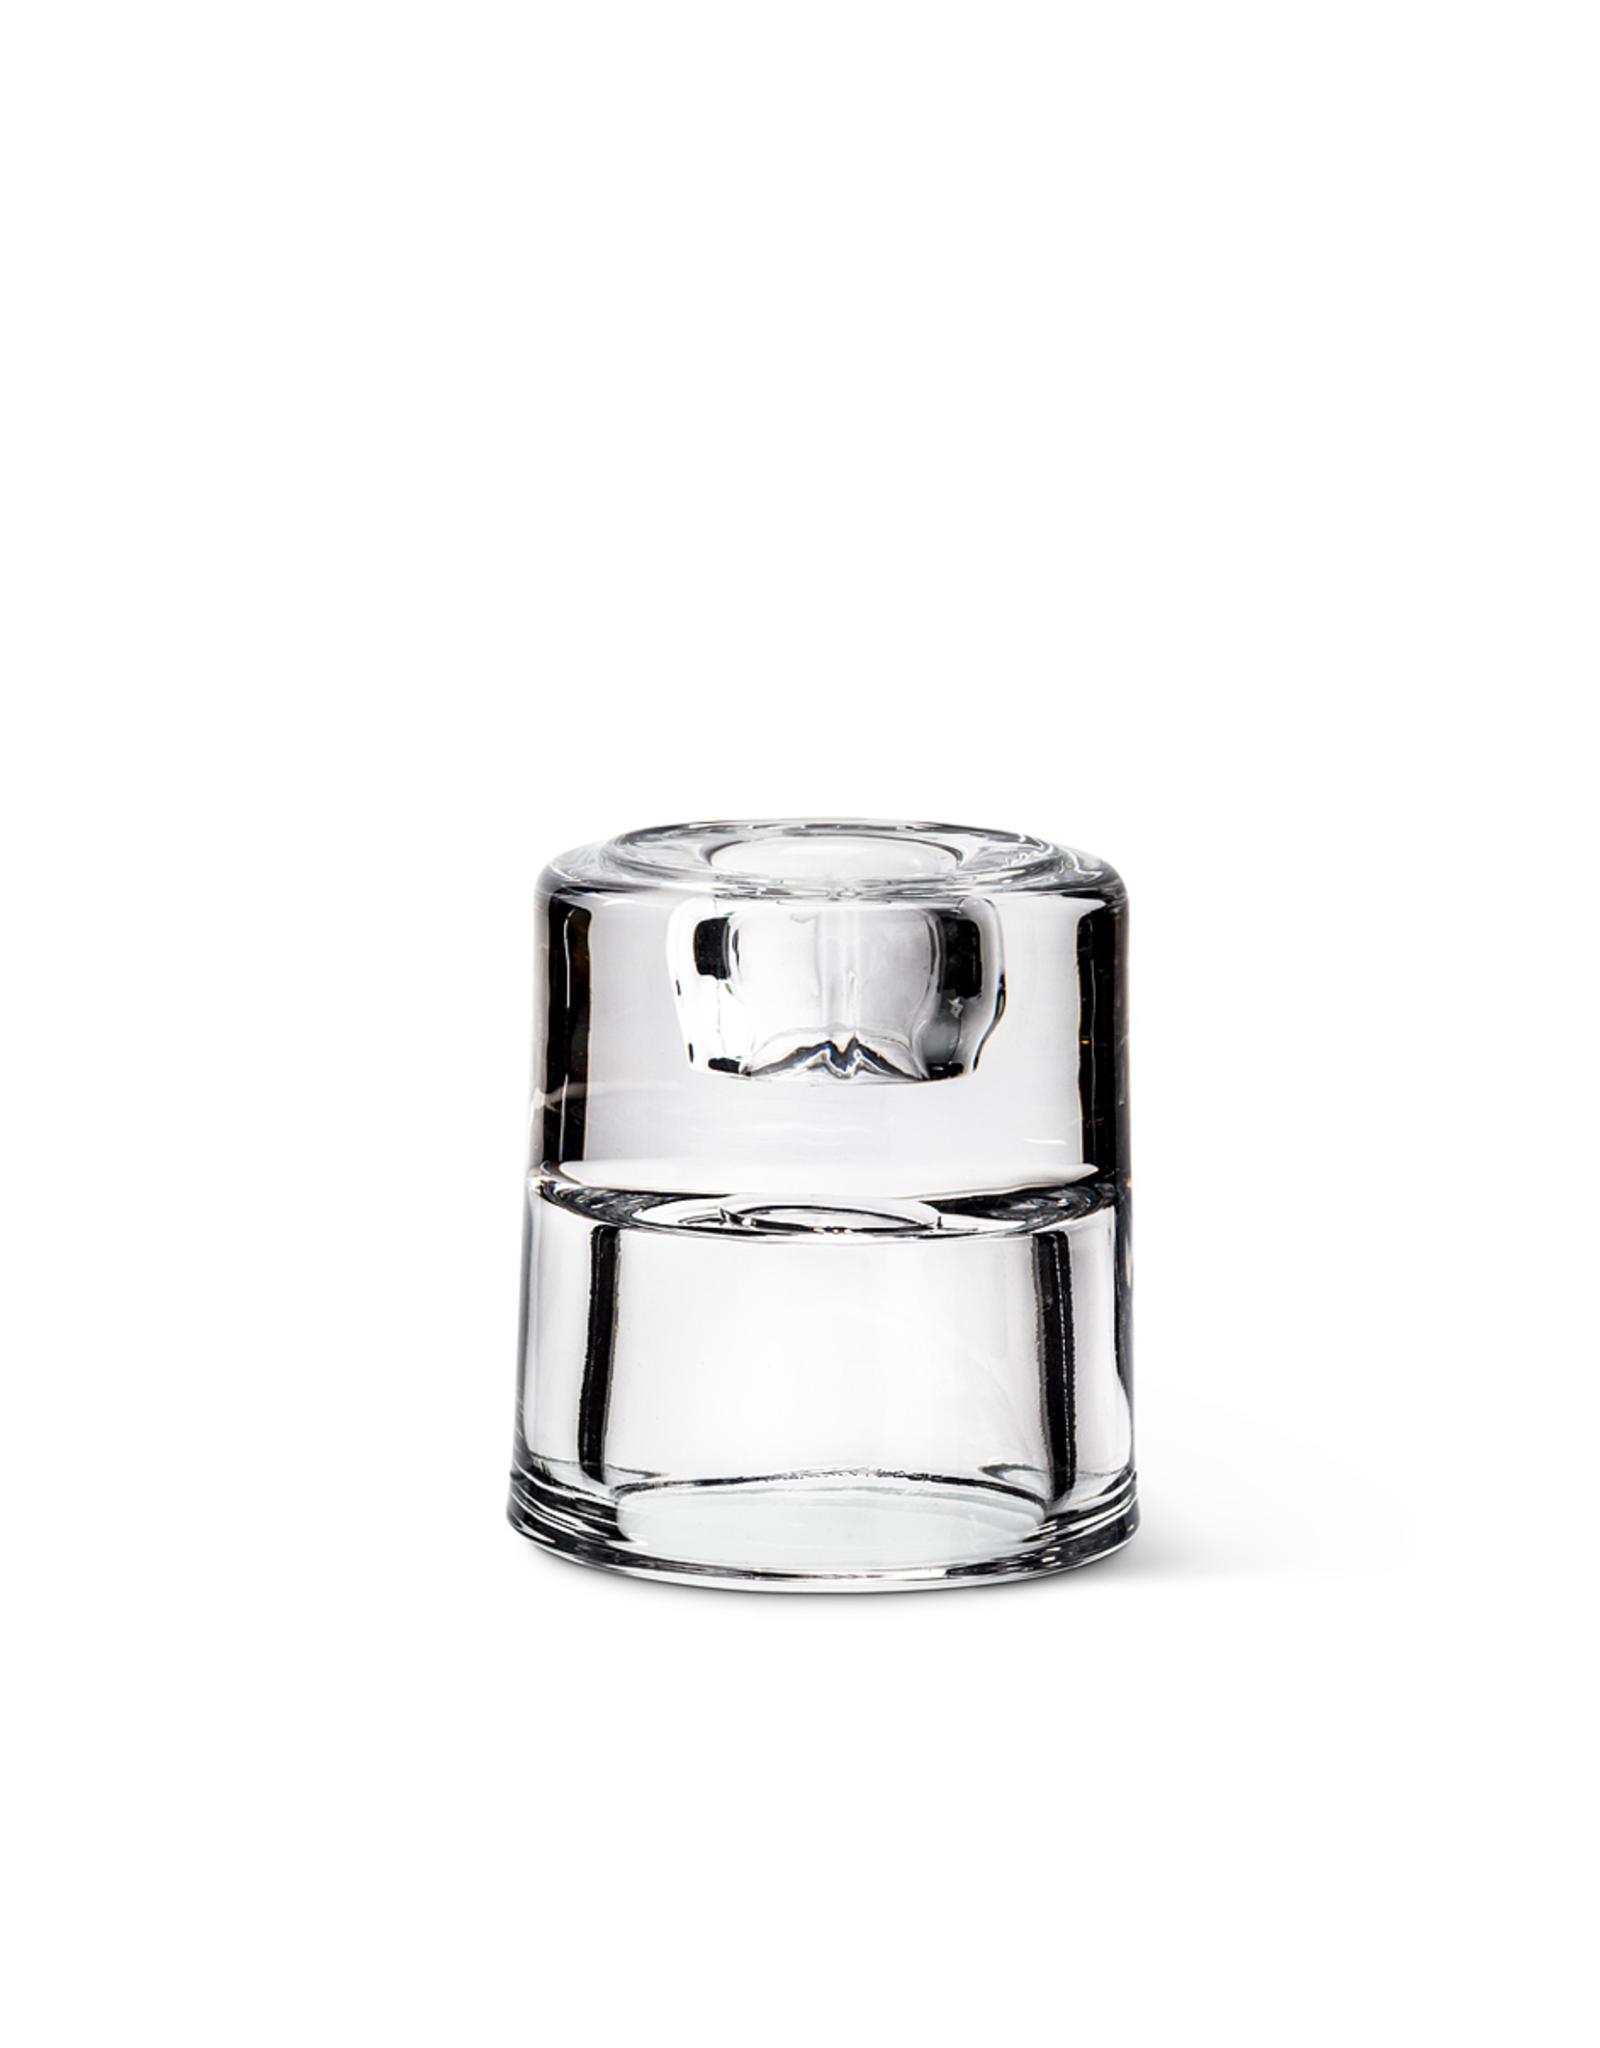 "ATT - Taper & Tealight Candle Holder / Reversible, Glass, 2.5"""